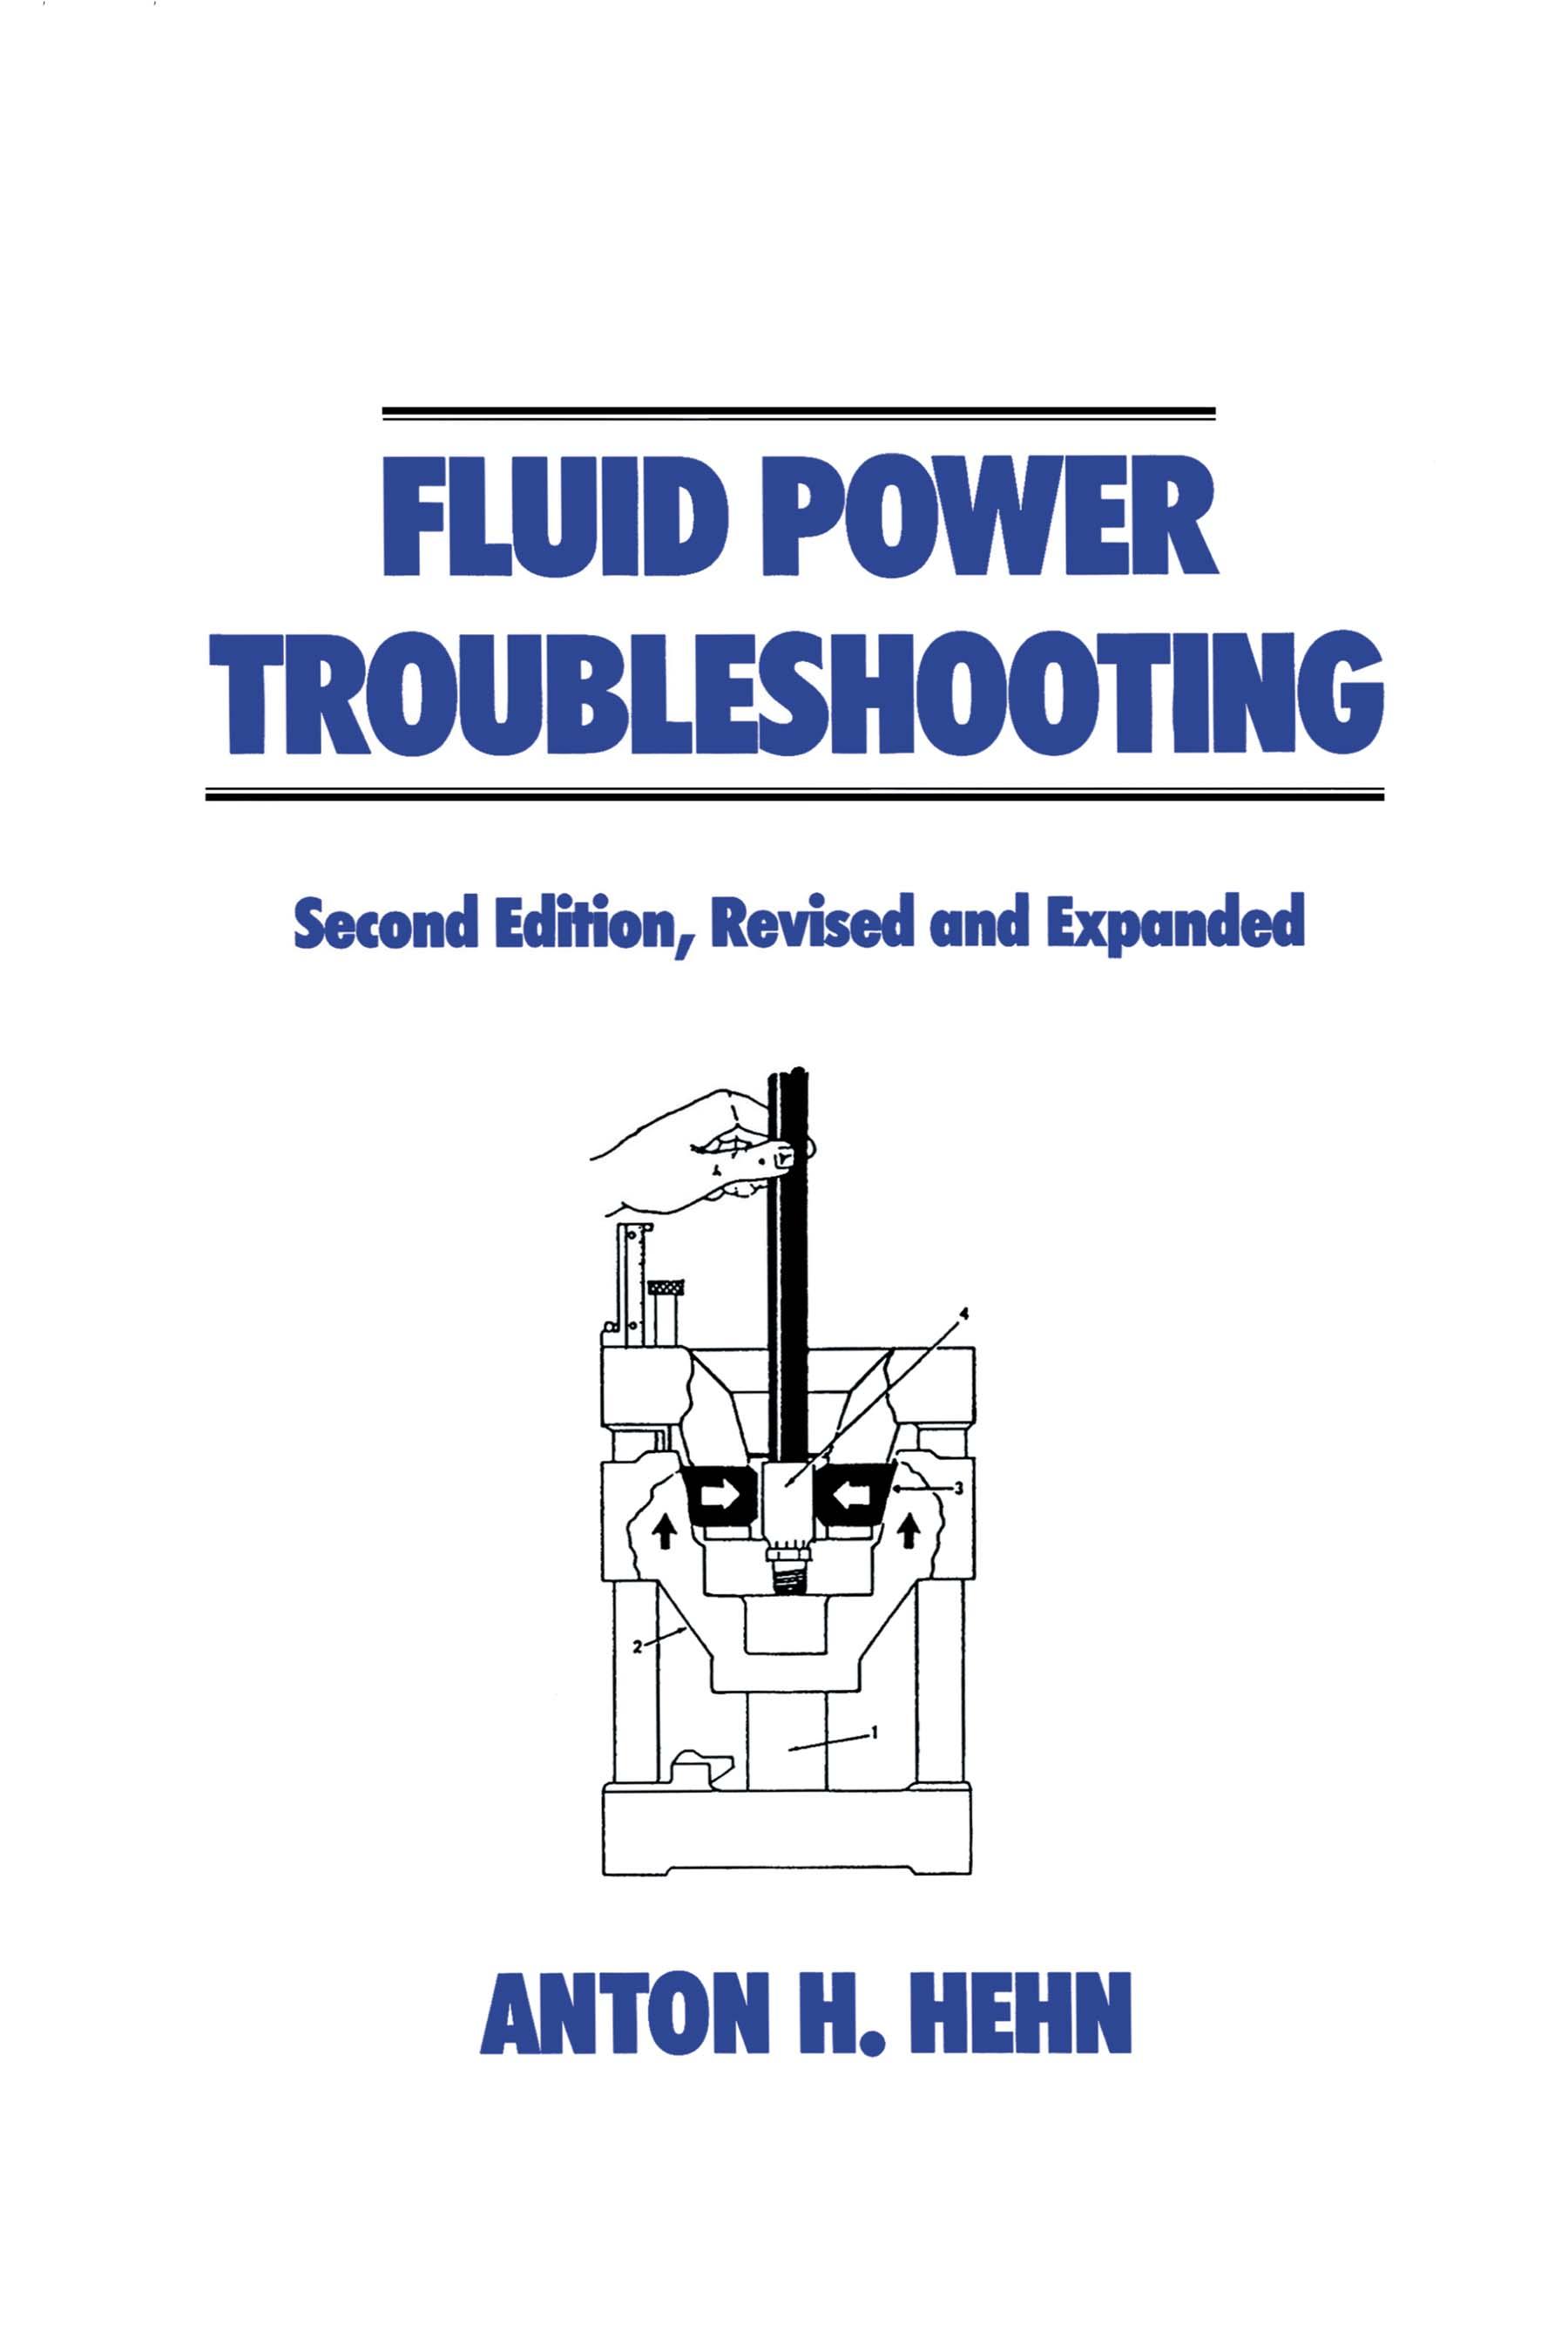 Fluid Power Troubleshooting